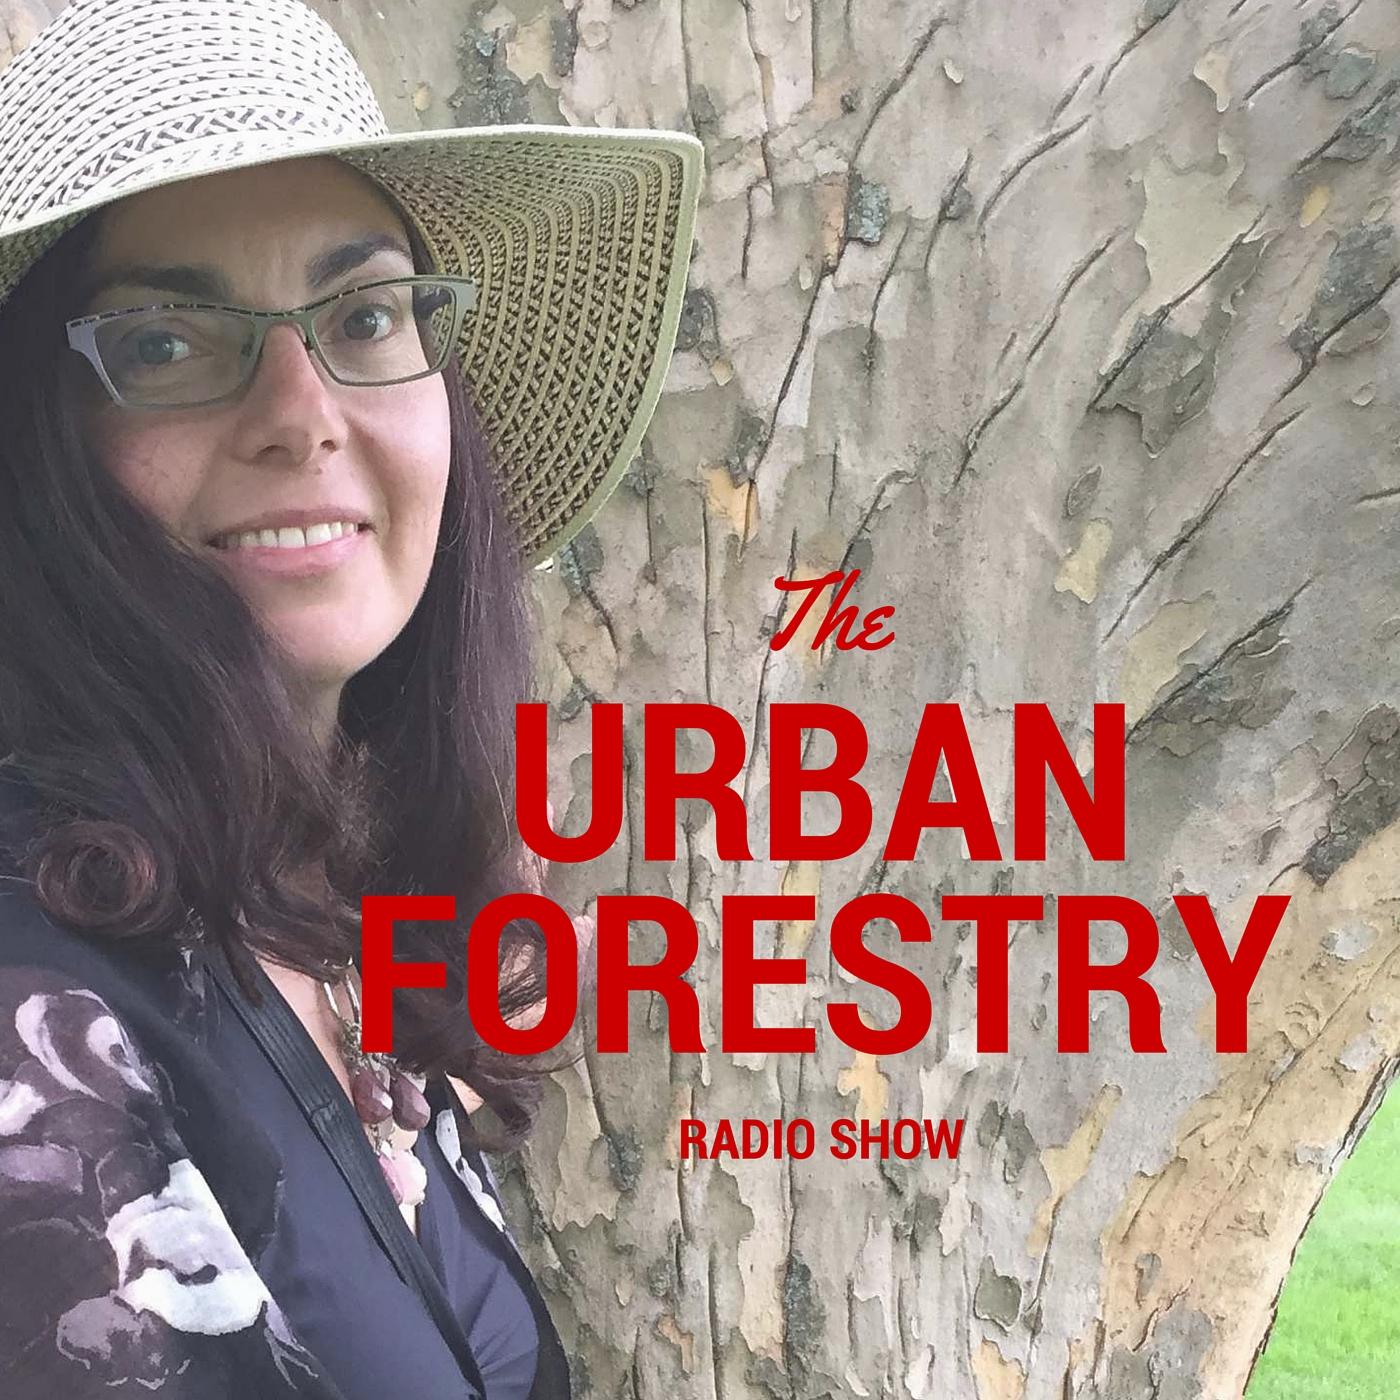 Urban Forestry Radio